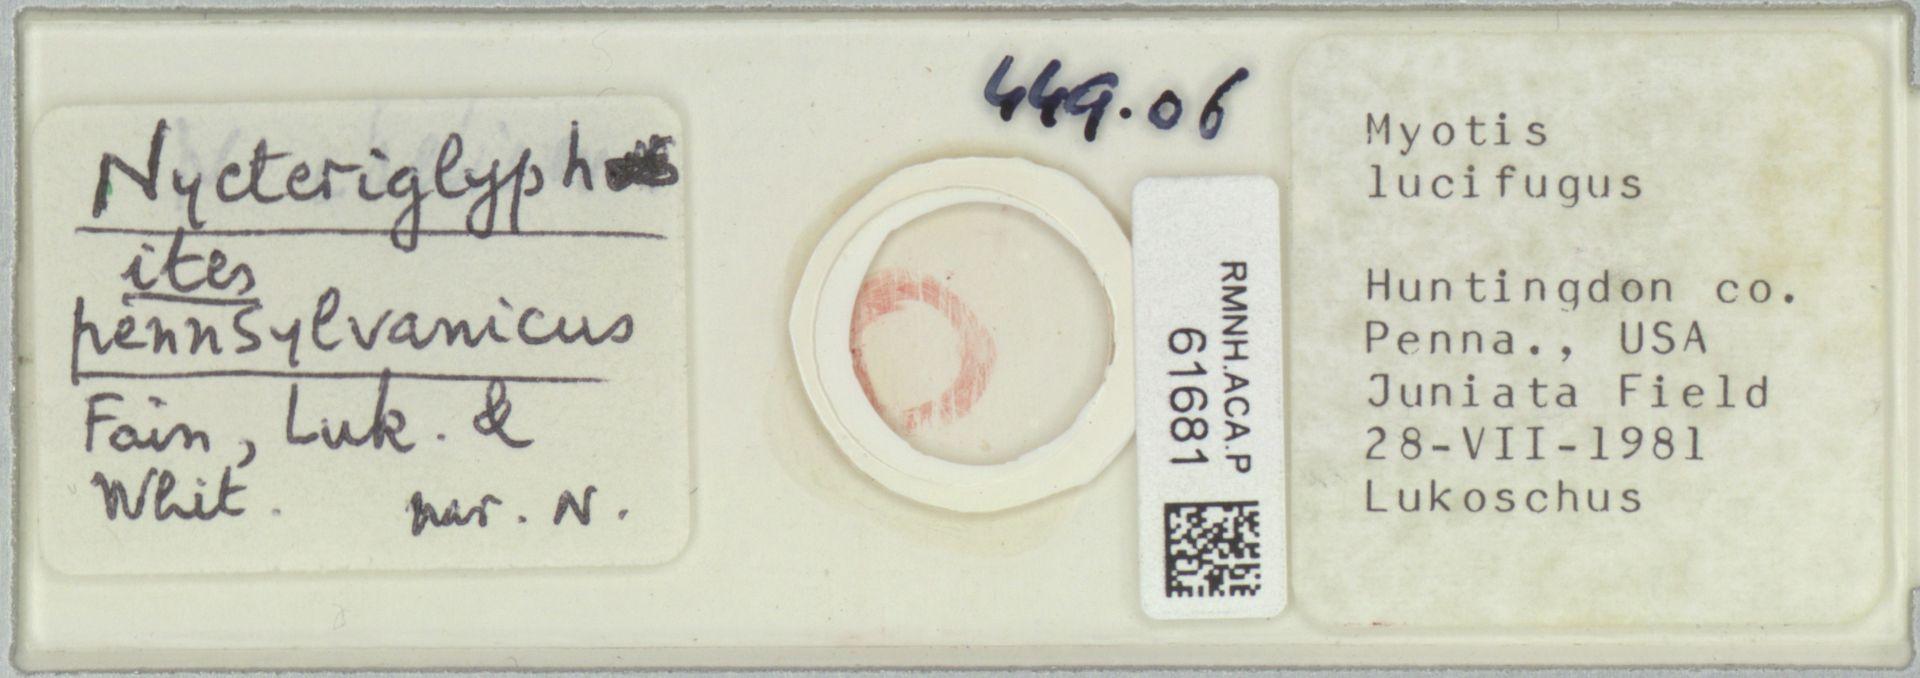 RMNH.ACA.P.61681   Nycteriglyphites pennsylvanicus Fain, Luk. & Whit.